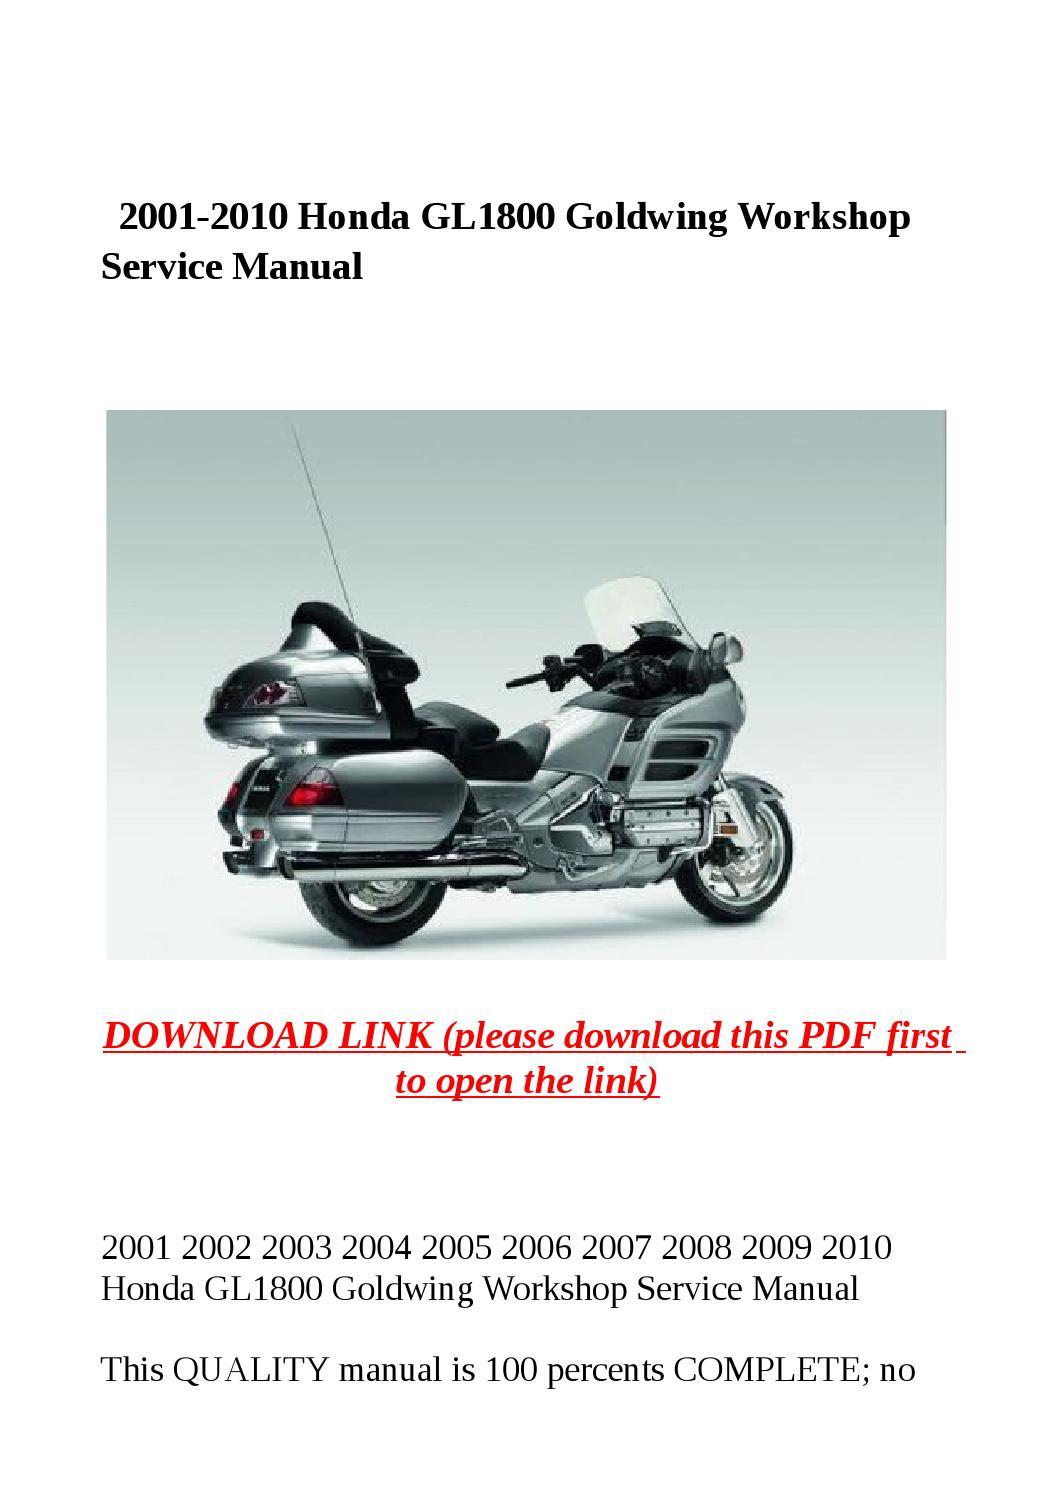 2008 Honda Goldwing Wiring Diagram 2001 2010 Honda Gl1800 Goldwing Workshop Service Manual By